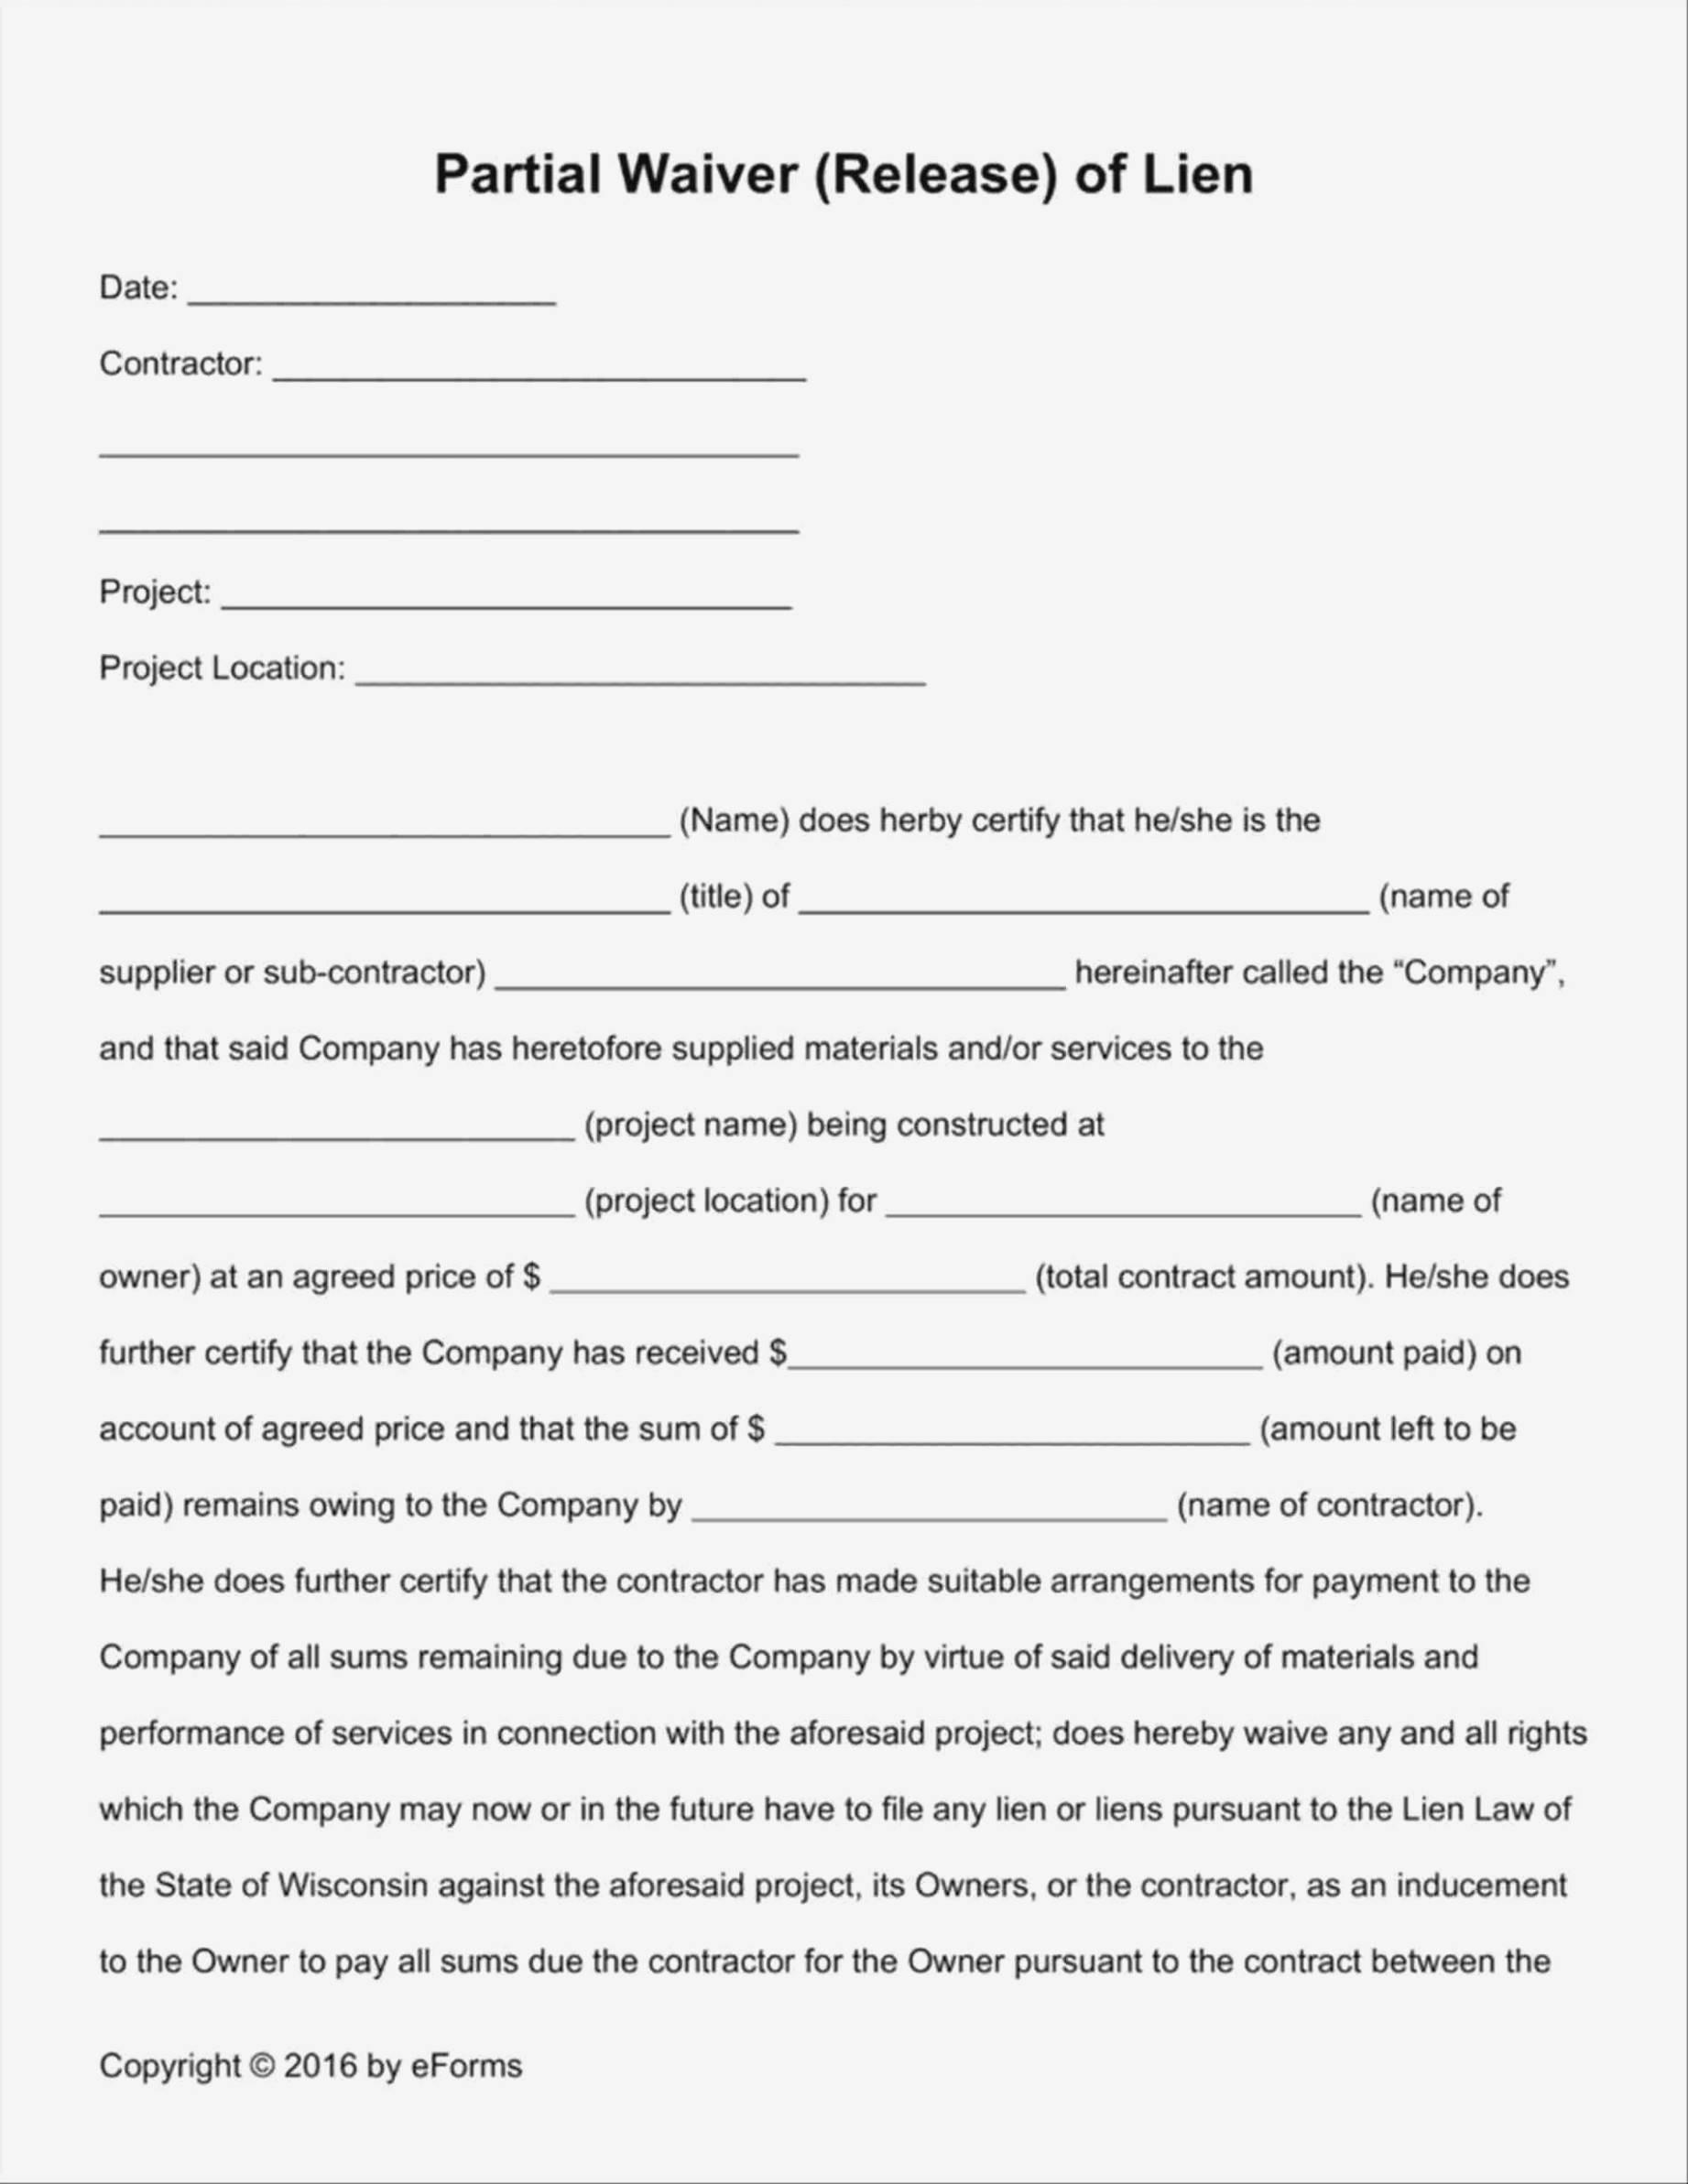 Lien Release Form Template